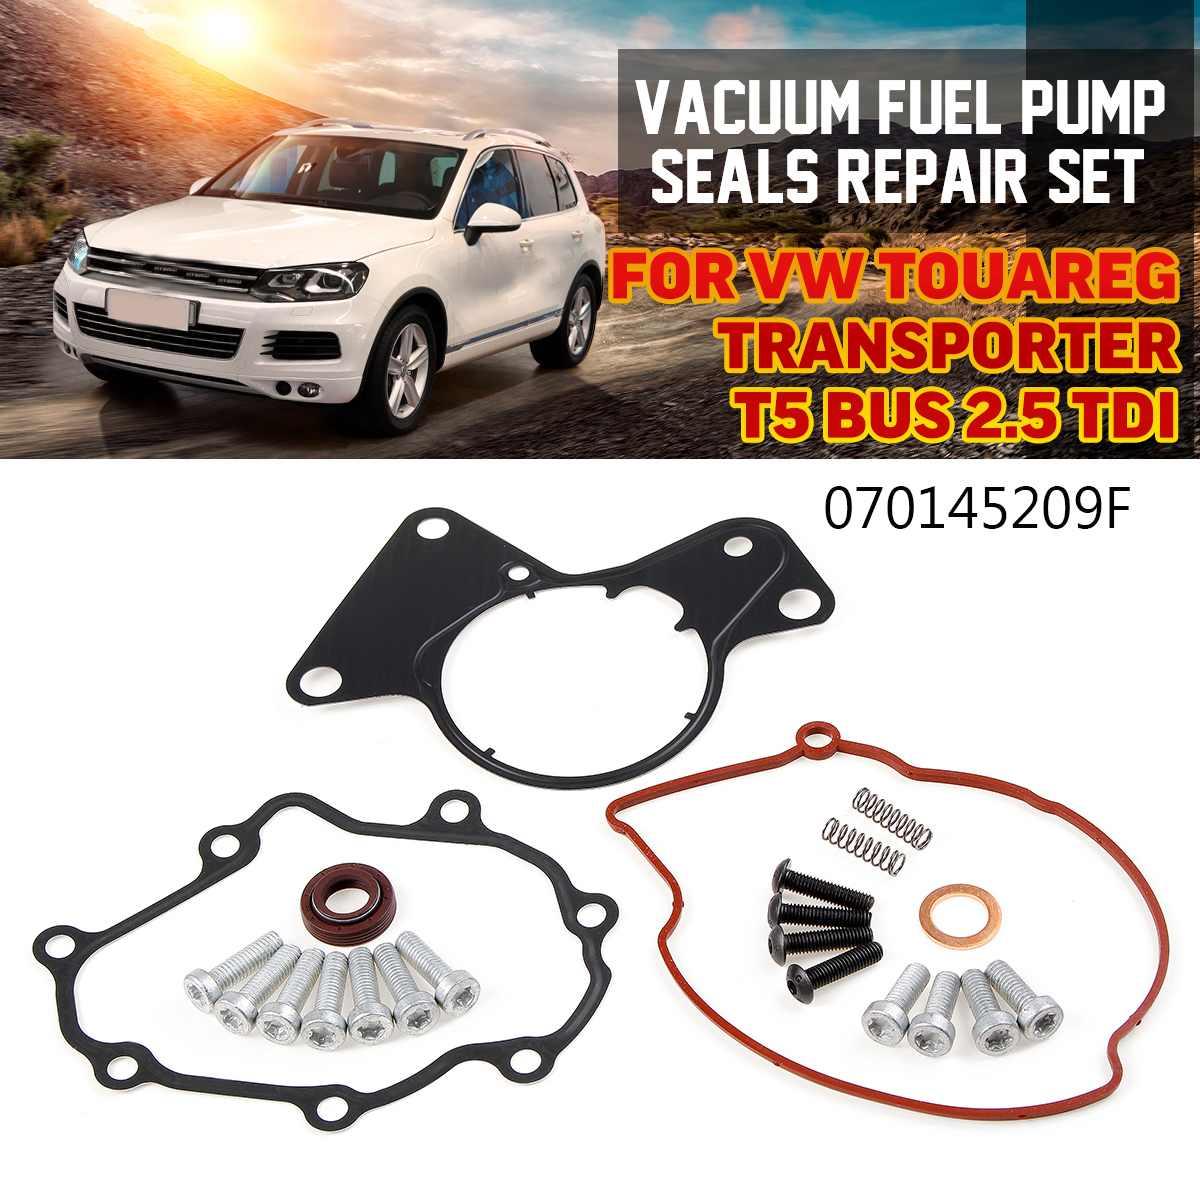 Vacuum Fuel Pump Seals Repair Set For VW Touareg Transporter T5 Transporter 2.5 TDI 070145209F 070145209H 070145209J